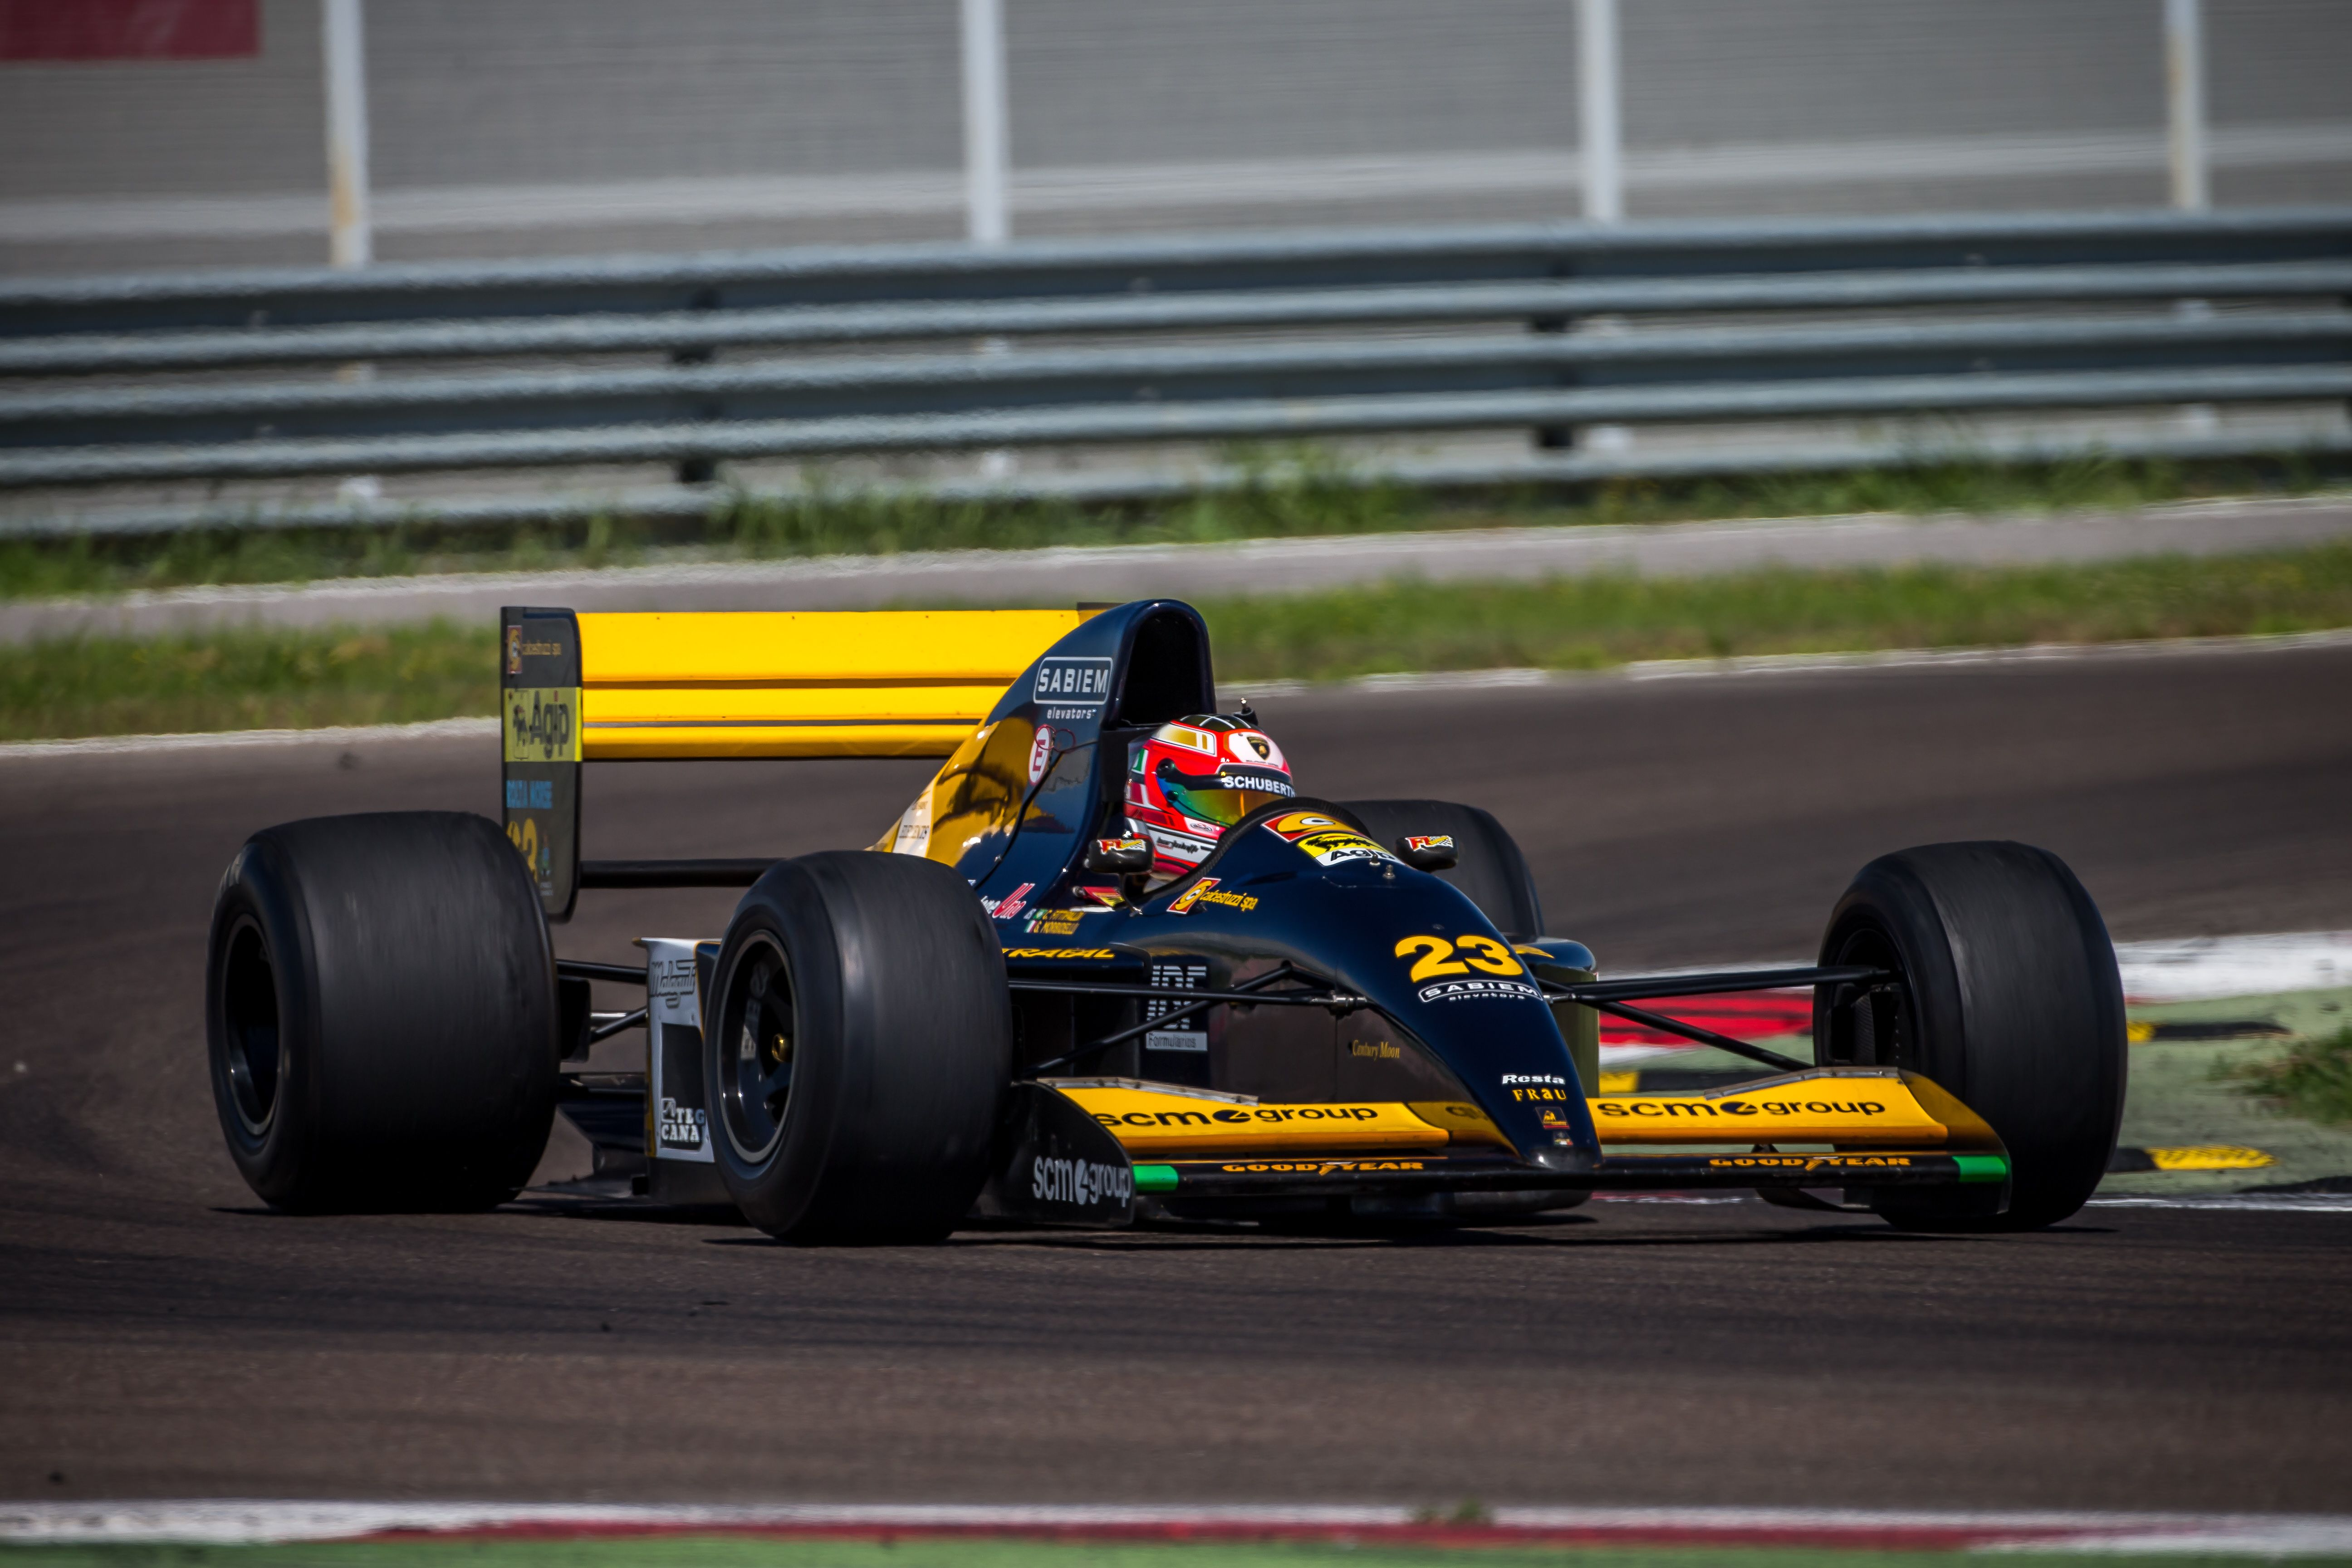 Lamborghini Restores Its V12 Powered Minardi F1 Car